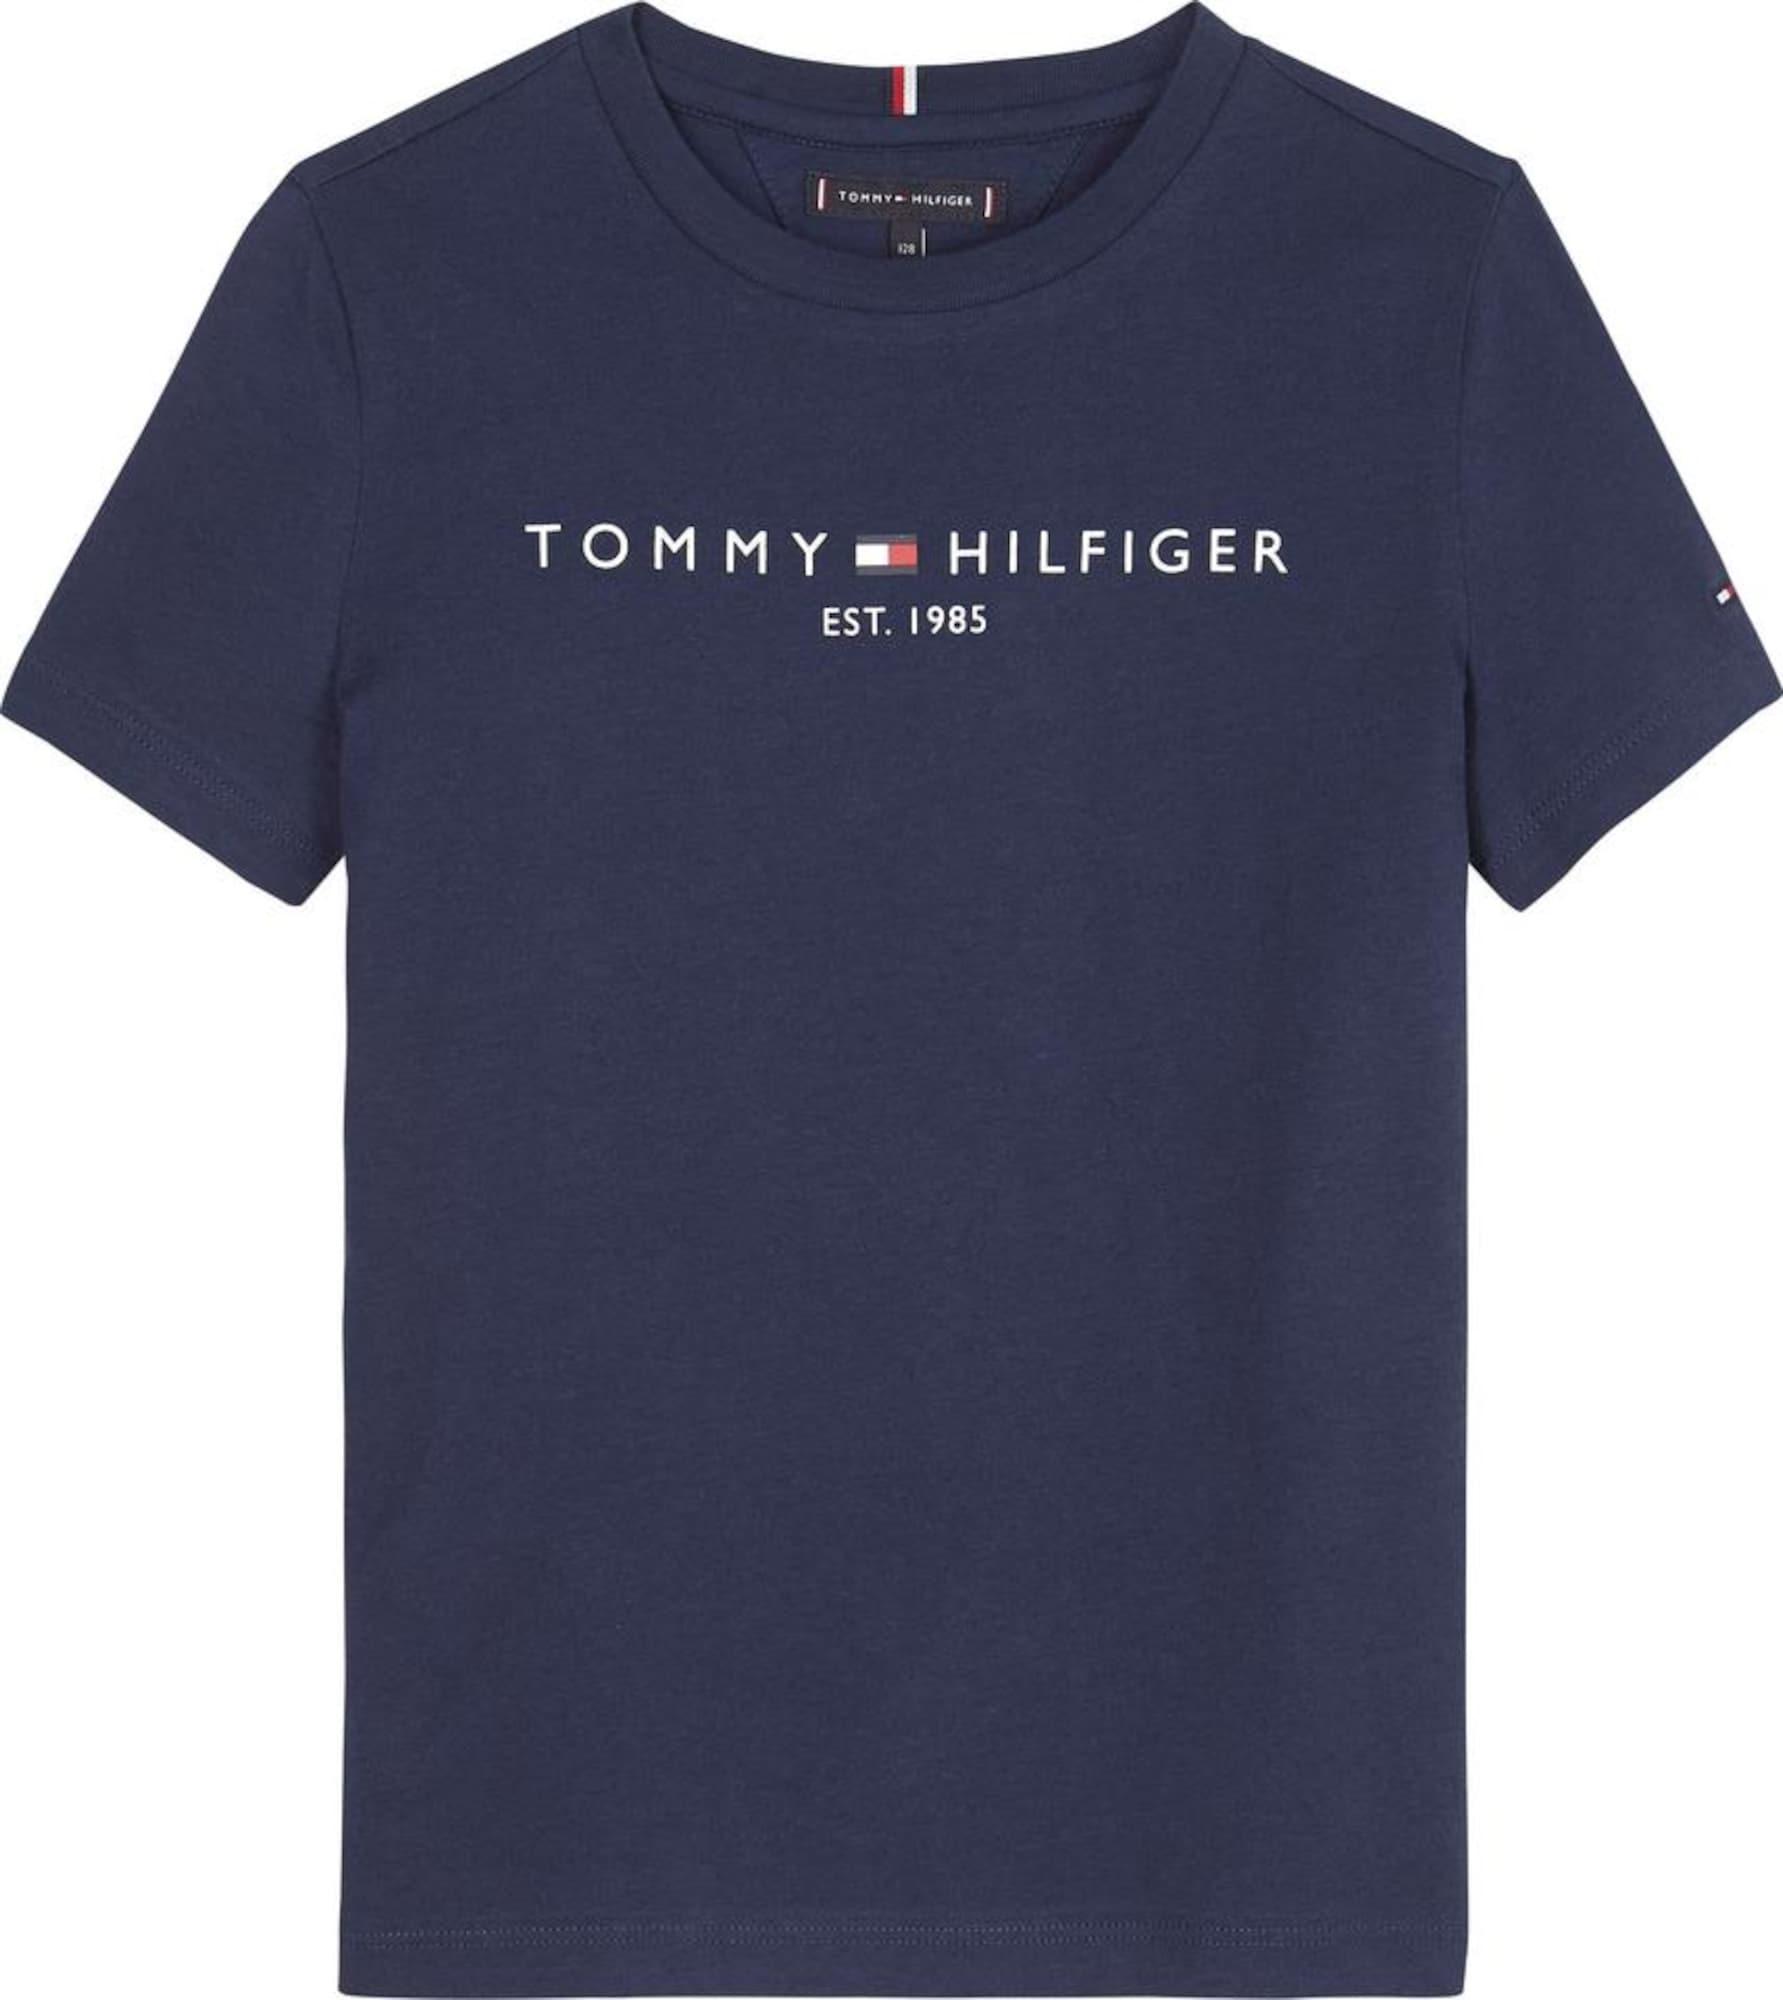 TOMMY HILFIGER Marškinėliai tamsiai mėlyna jūros spalva